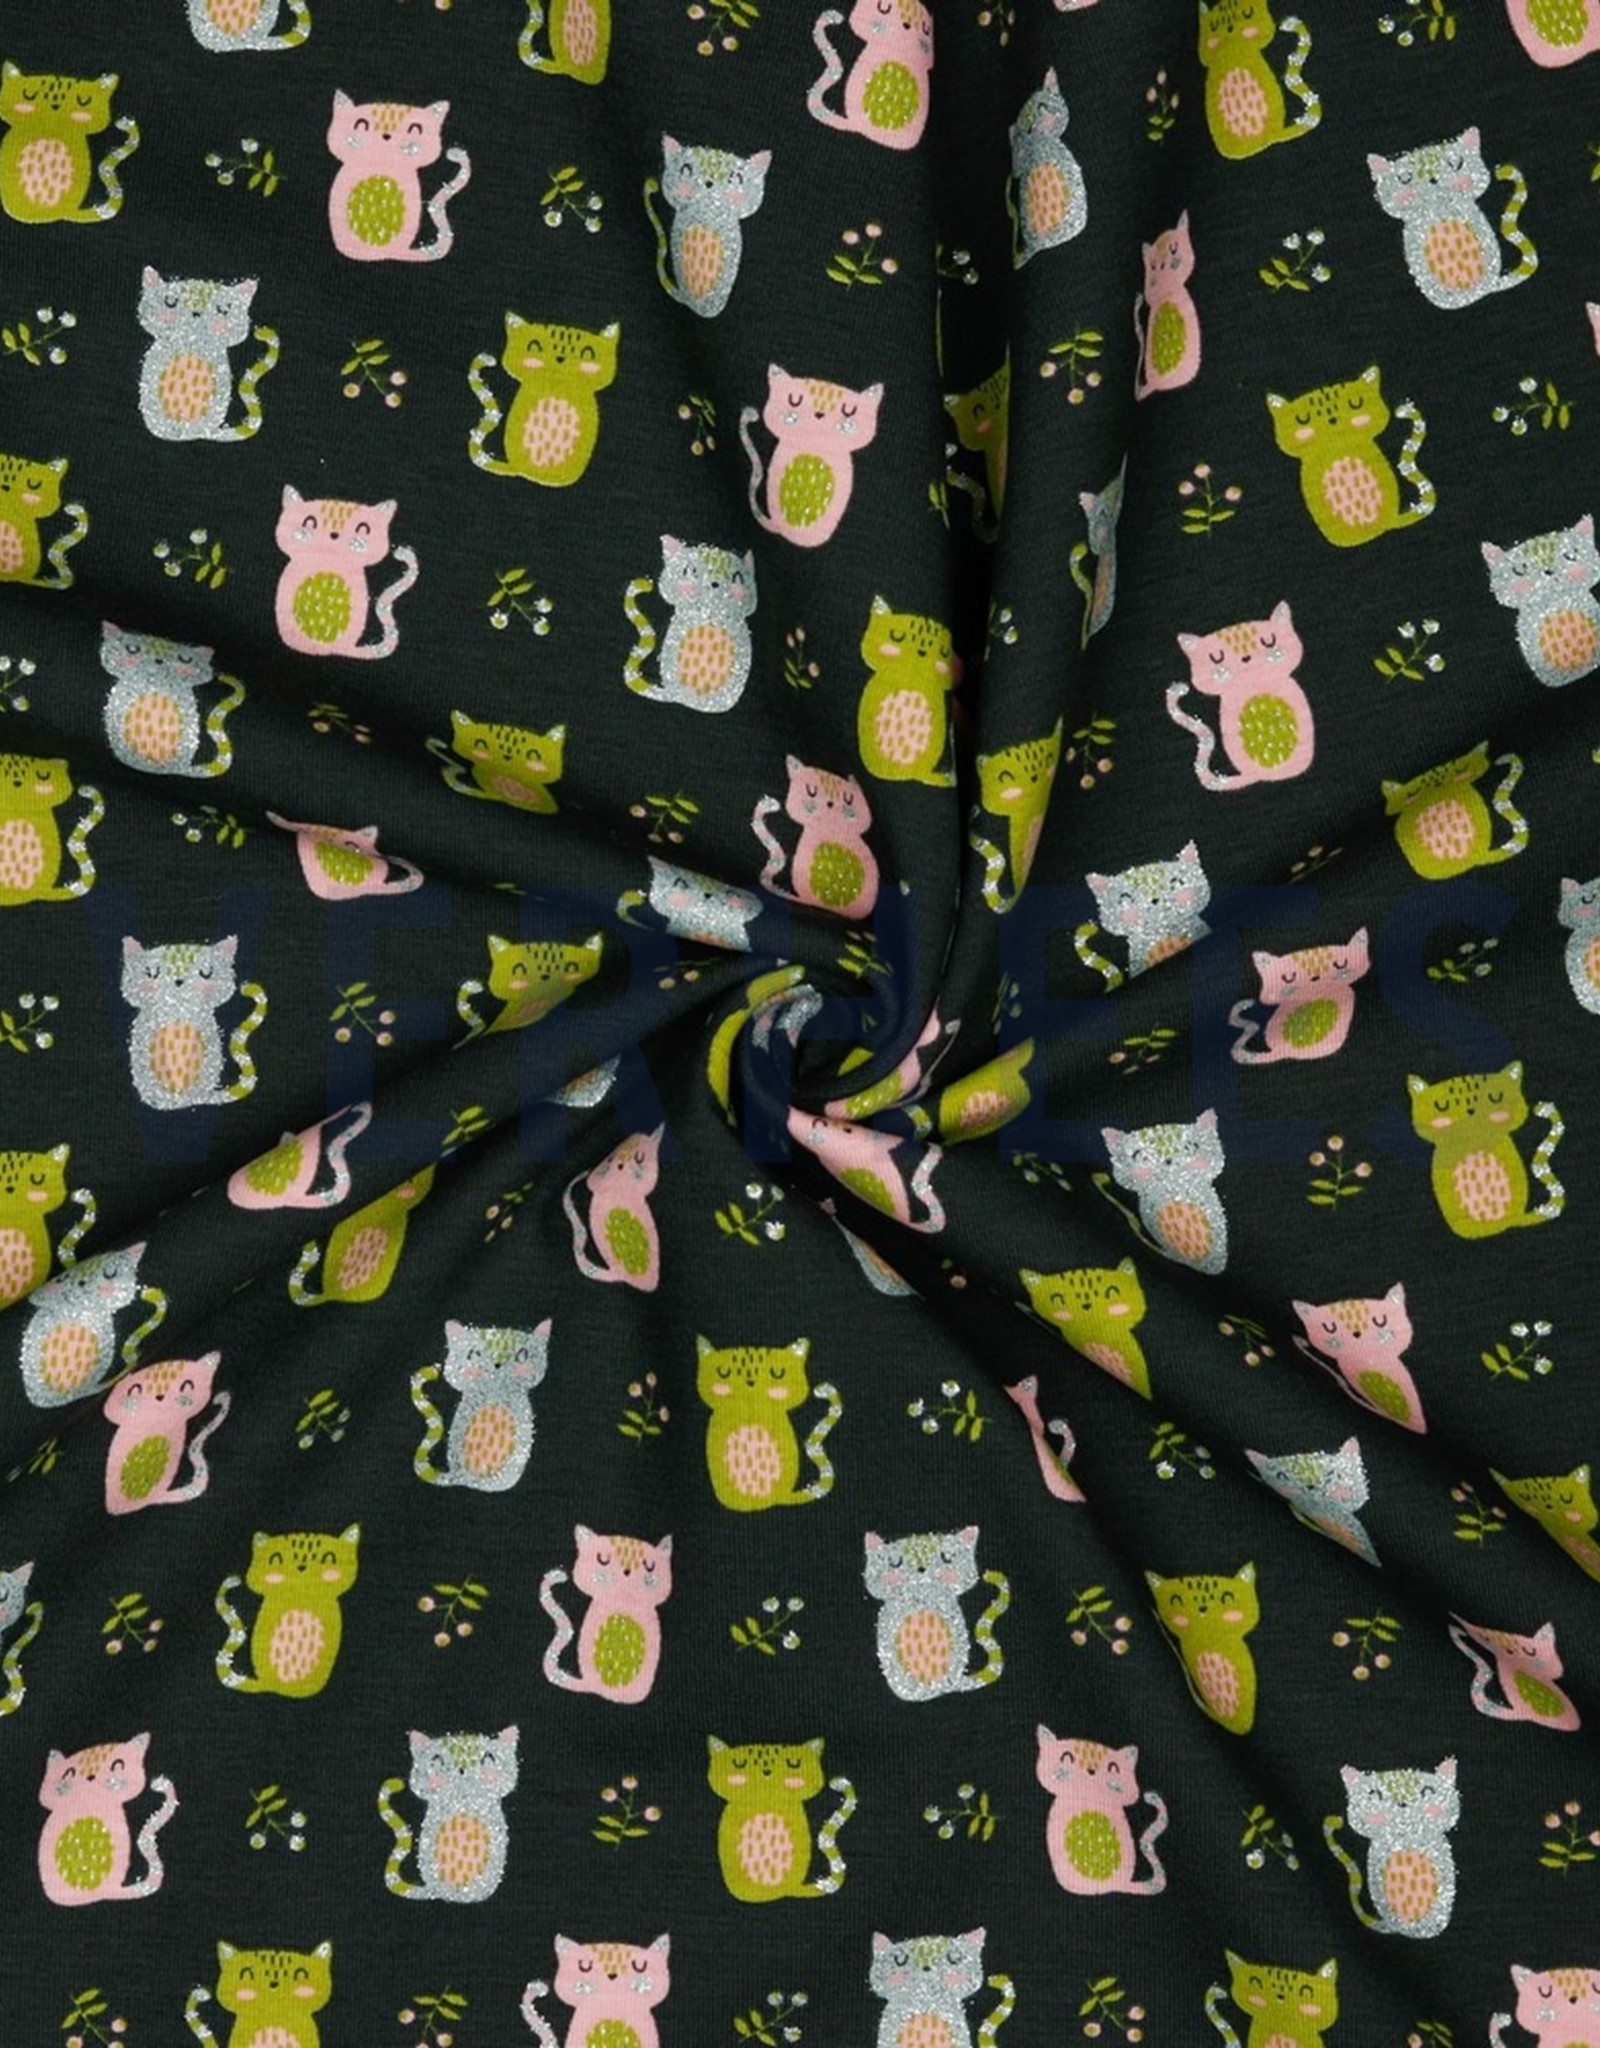 Poppy JERSEY GLITTER SWEET CAT - ANTHRACITE